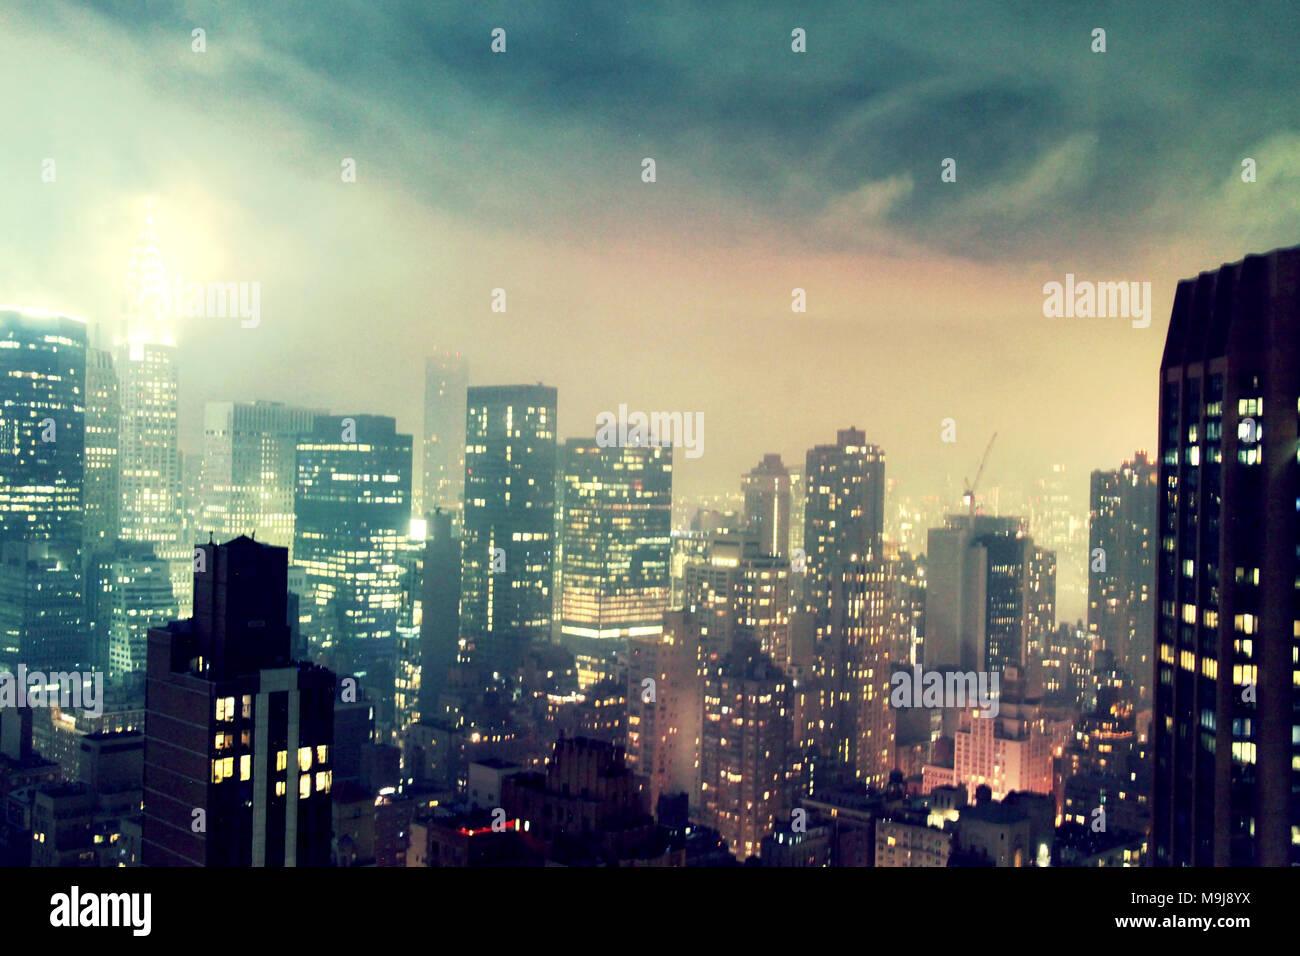 New York skyline - Stock Image